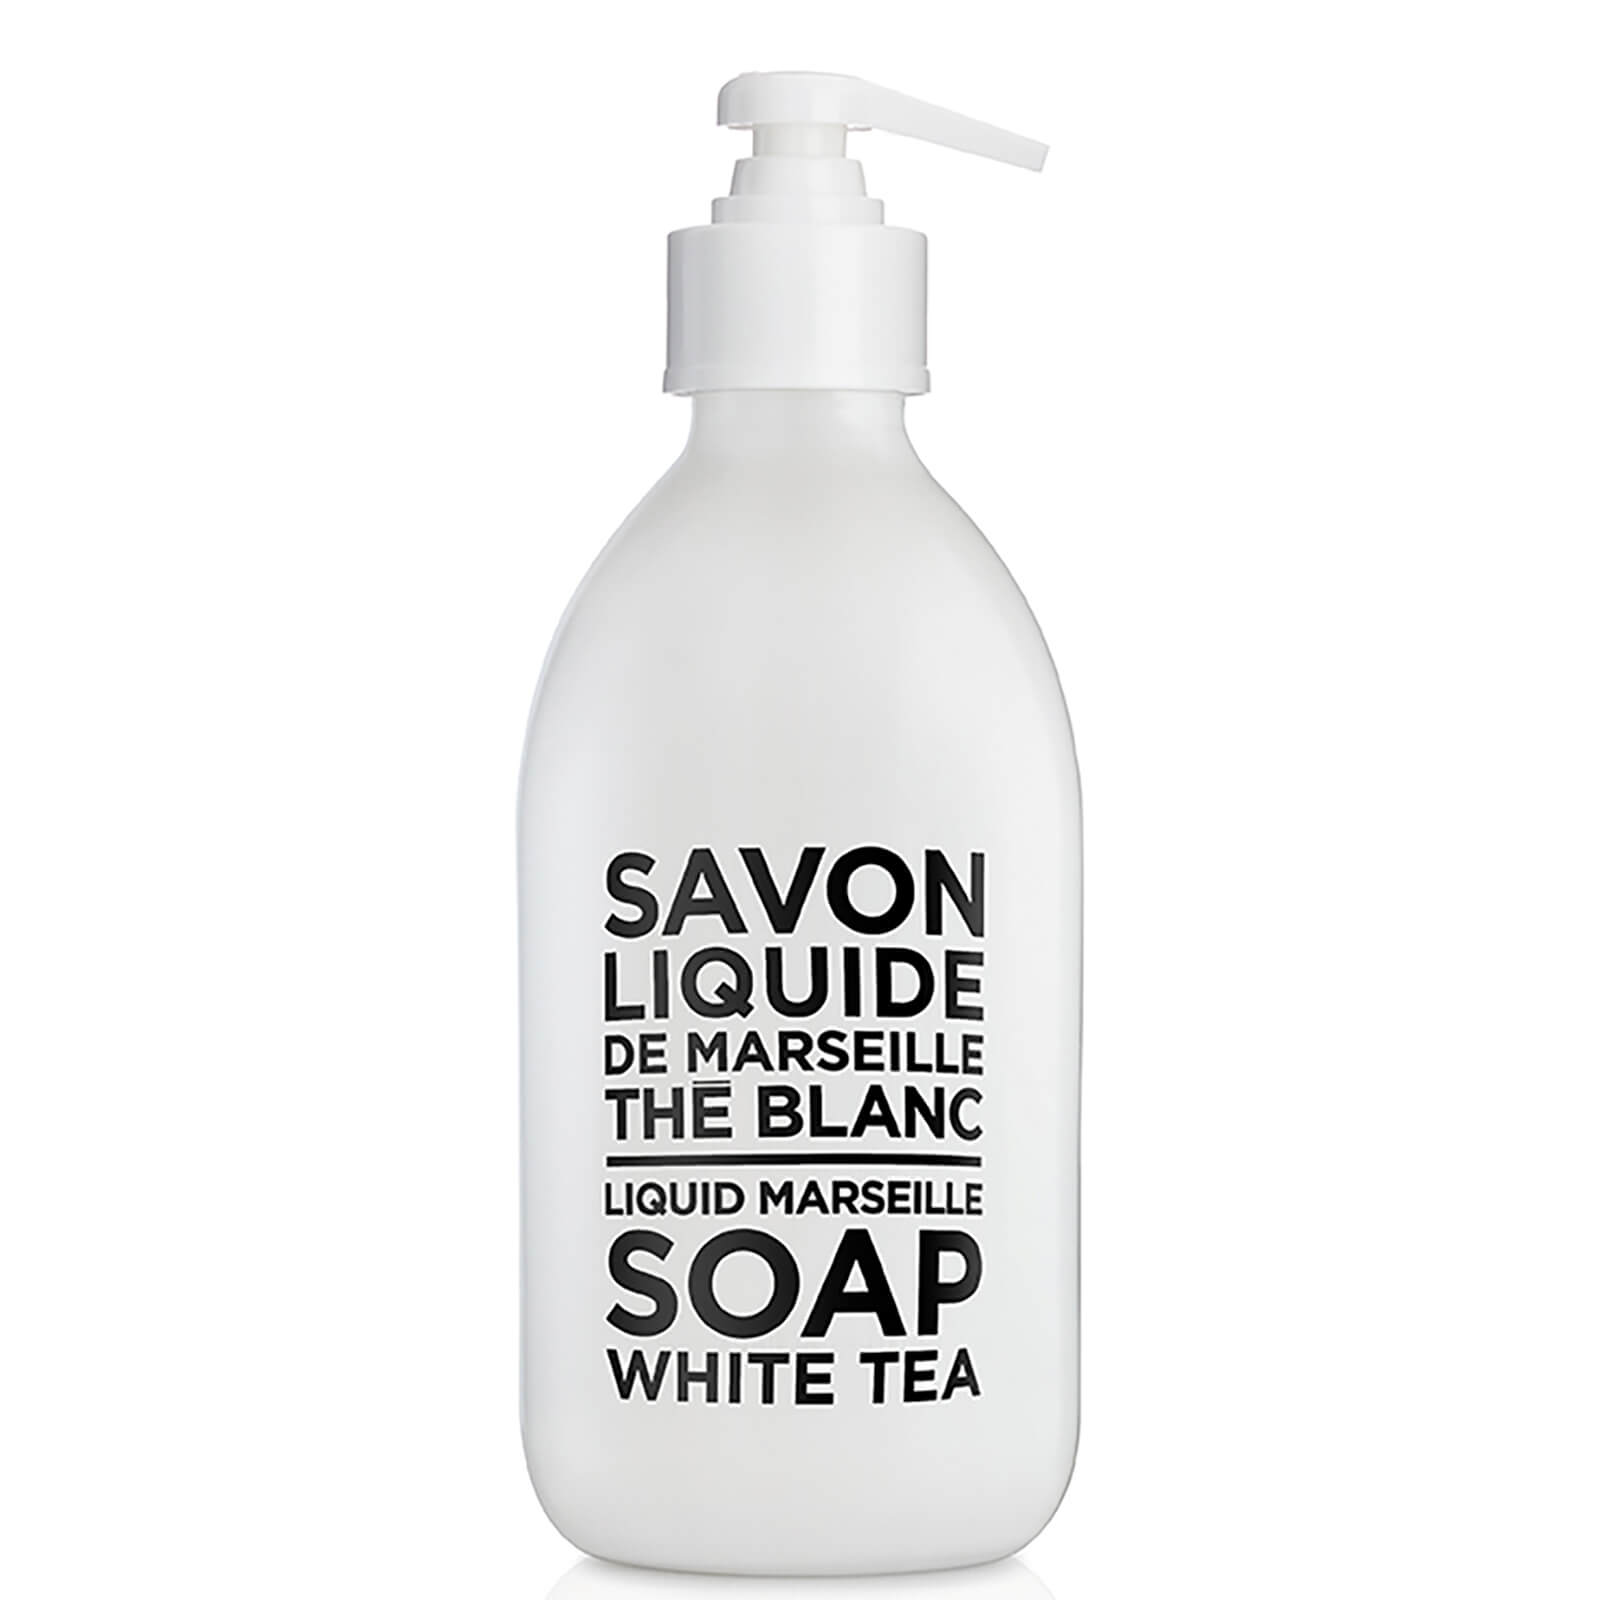 Купить Compagnie de Provence Liquid Marseille Soap 300ml (Various Options) - White Tea